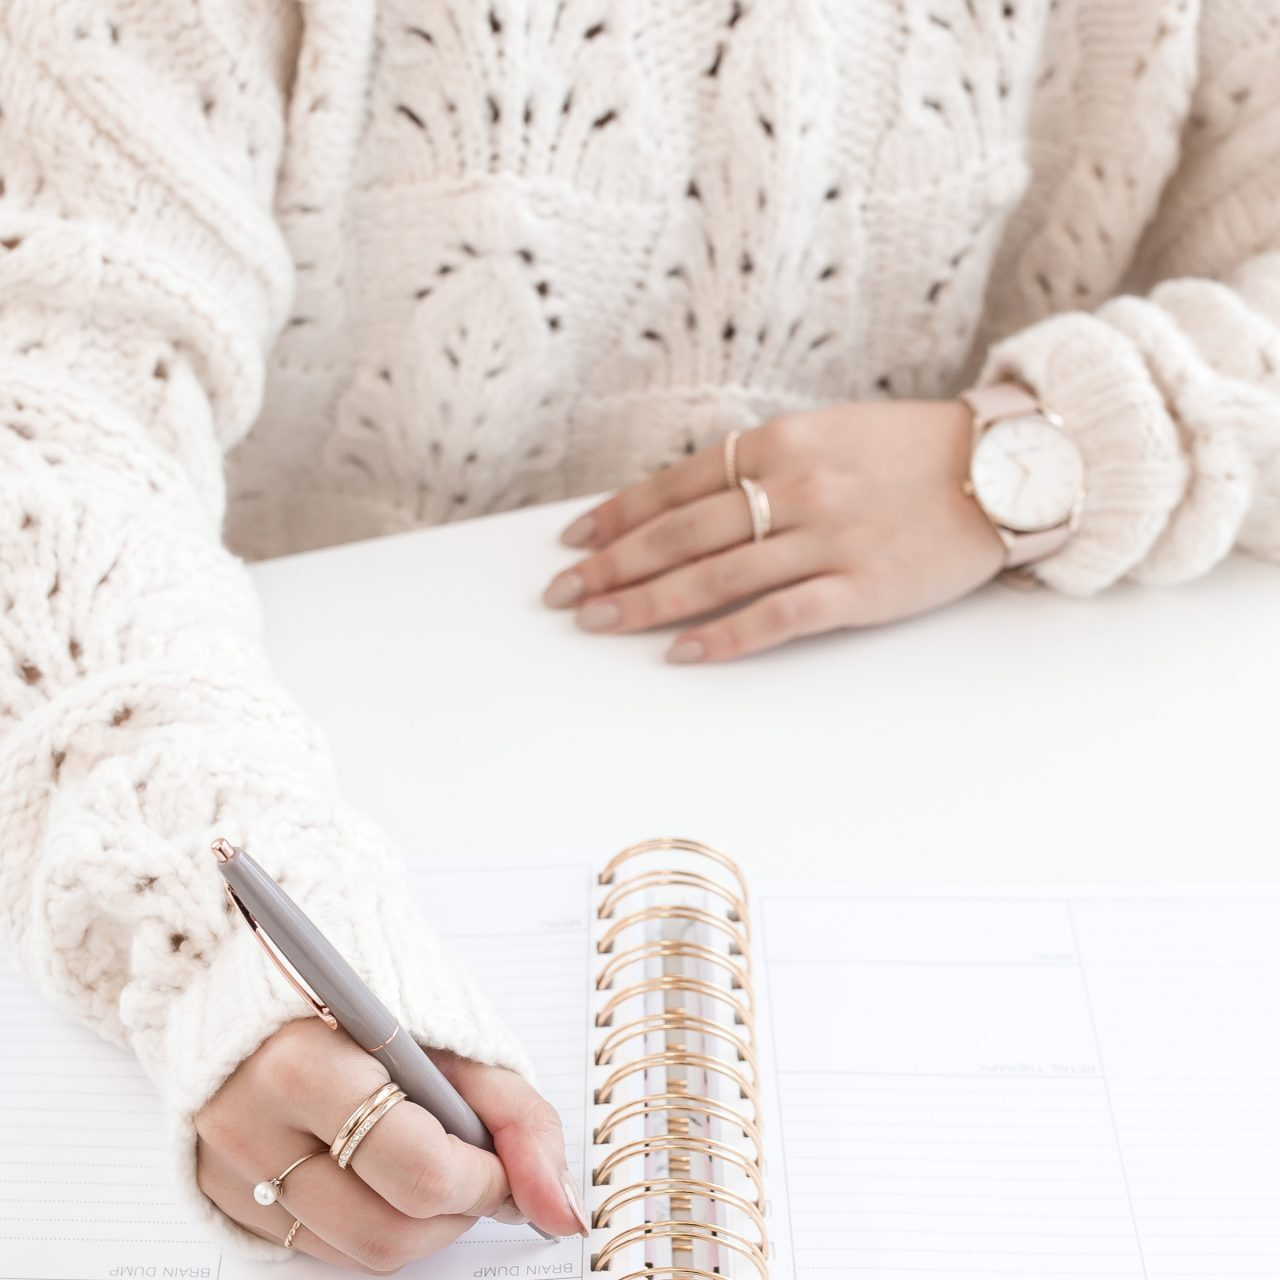 How Boss Girl Bloggers Turned Their Setbacks Into Comebacks